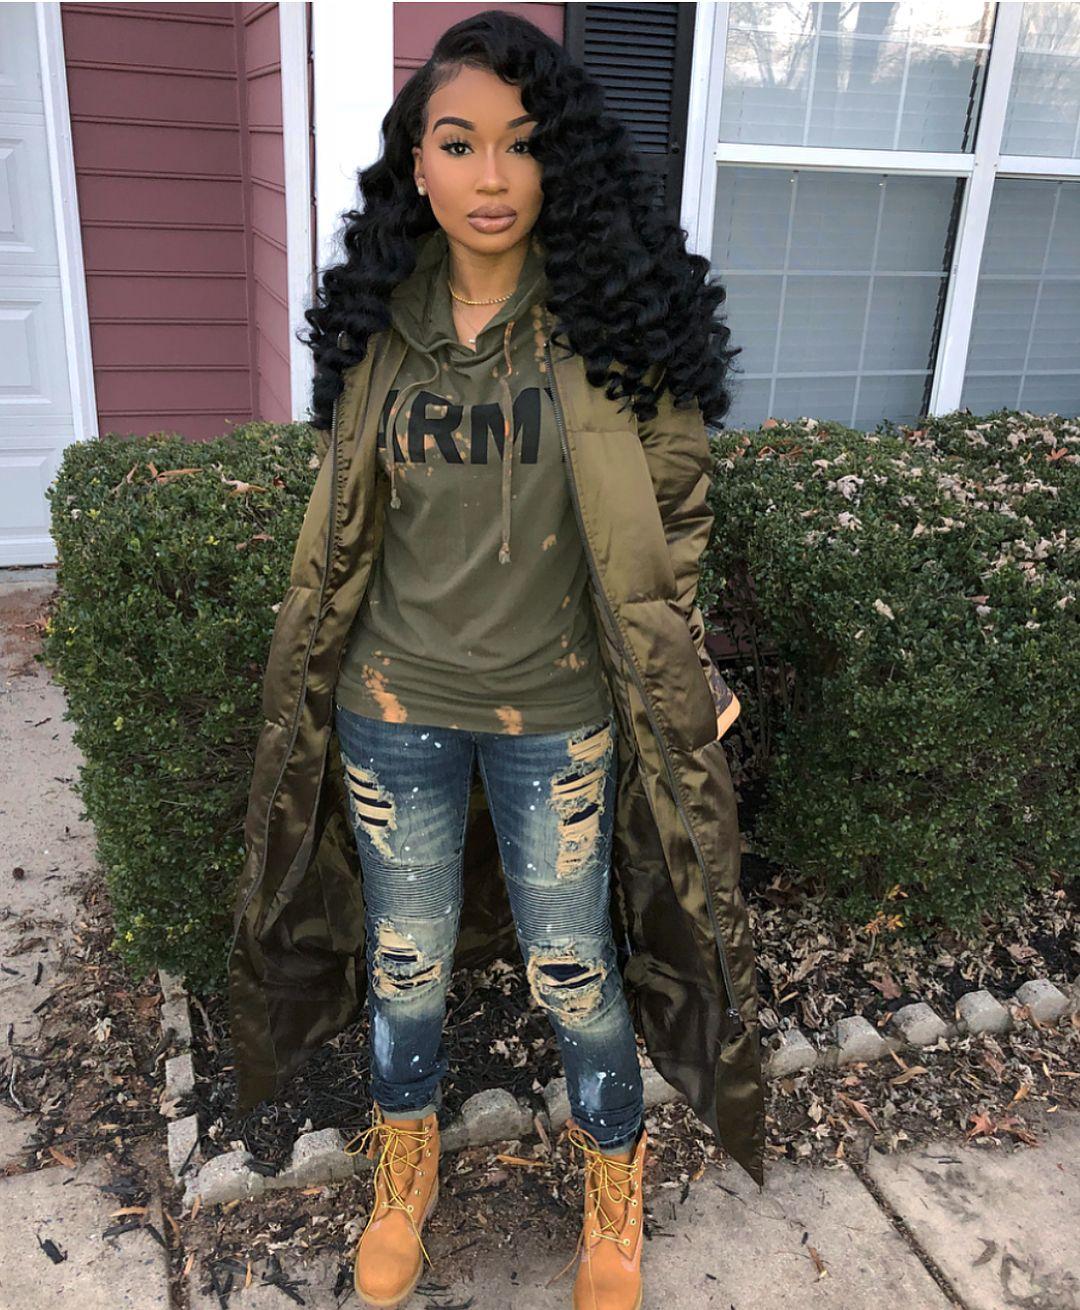 Black Girl Swag Outfits: Black Girl Swag Outfits 2017